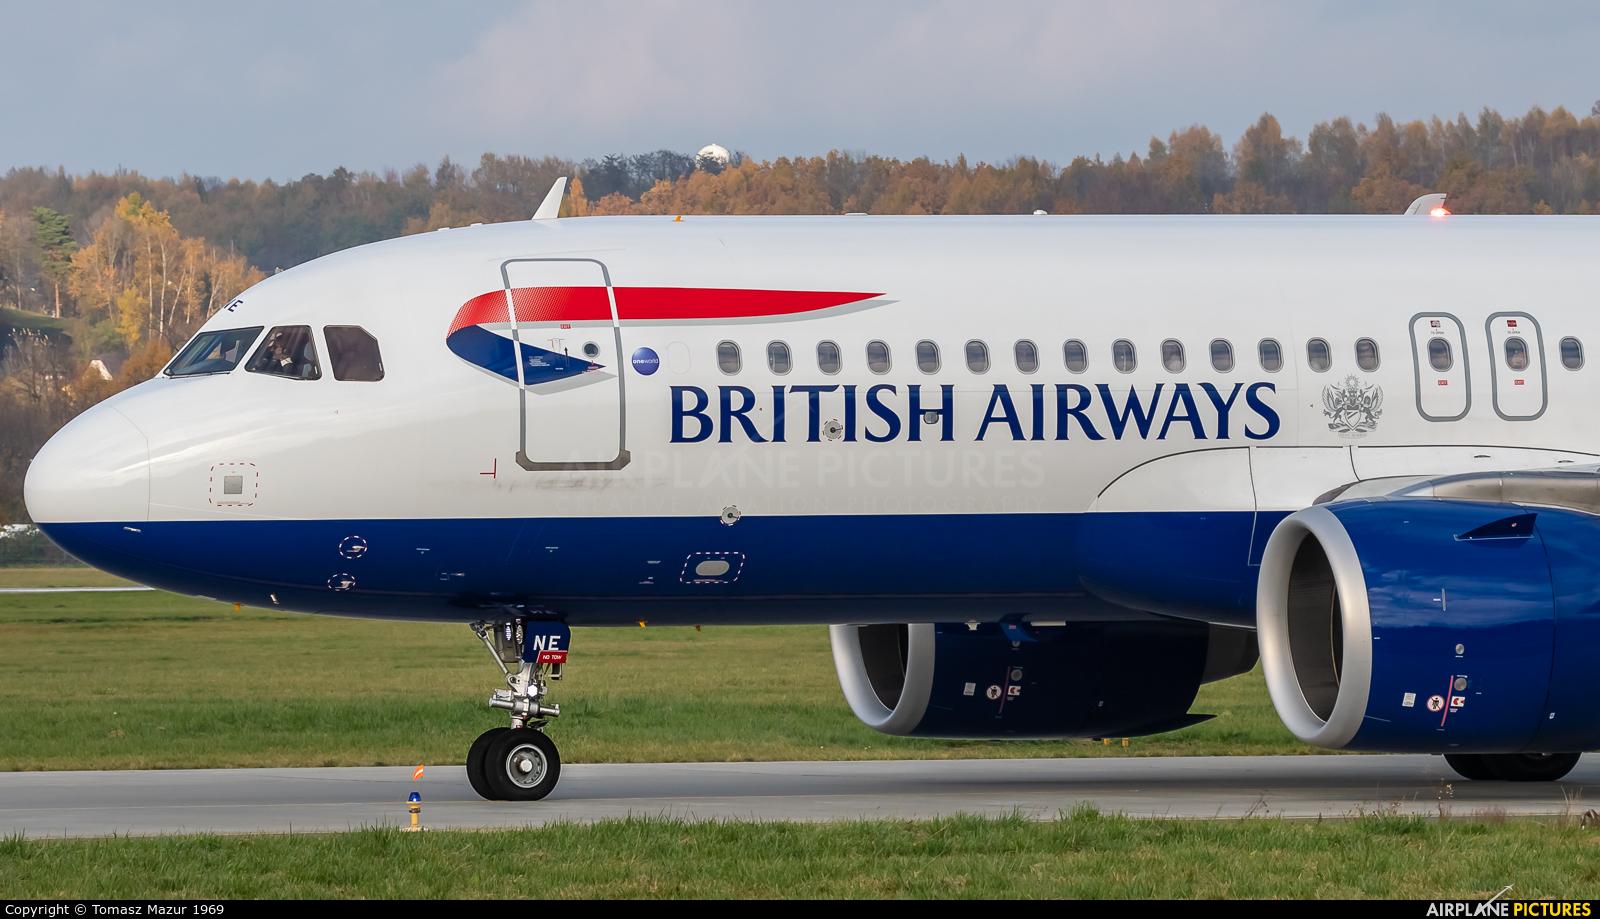 British Airways G-TTNE aircraft at Kraków - John Paul II Intl